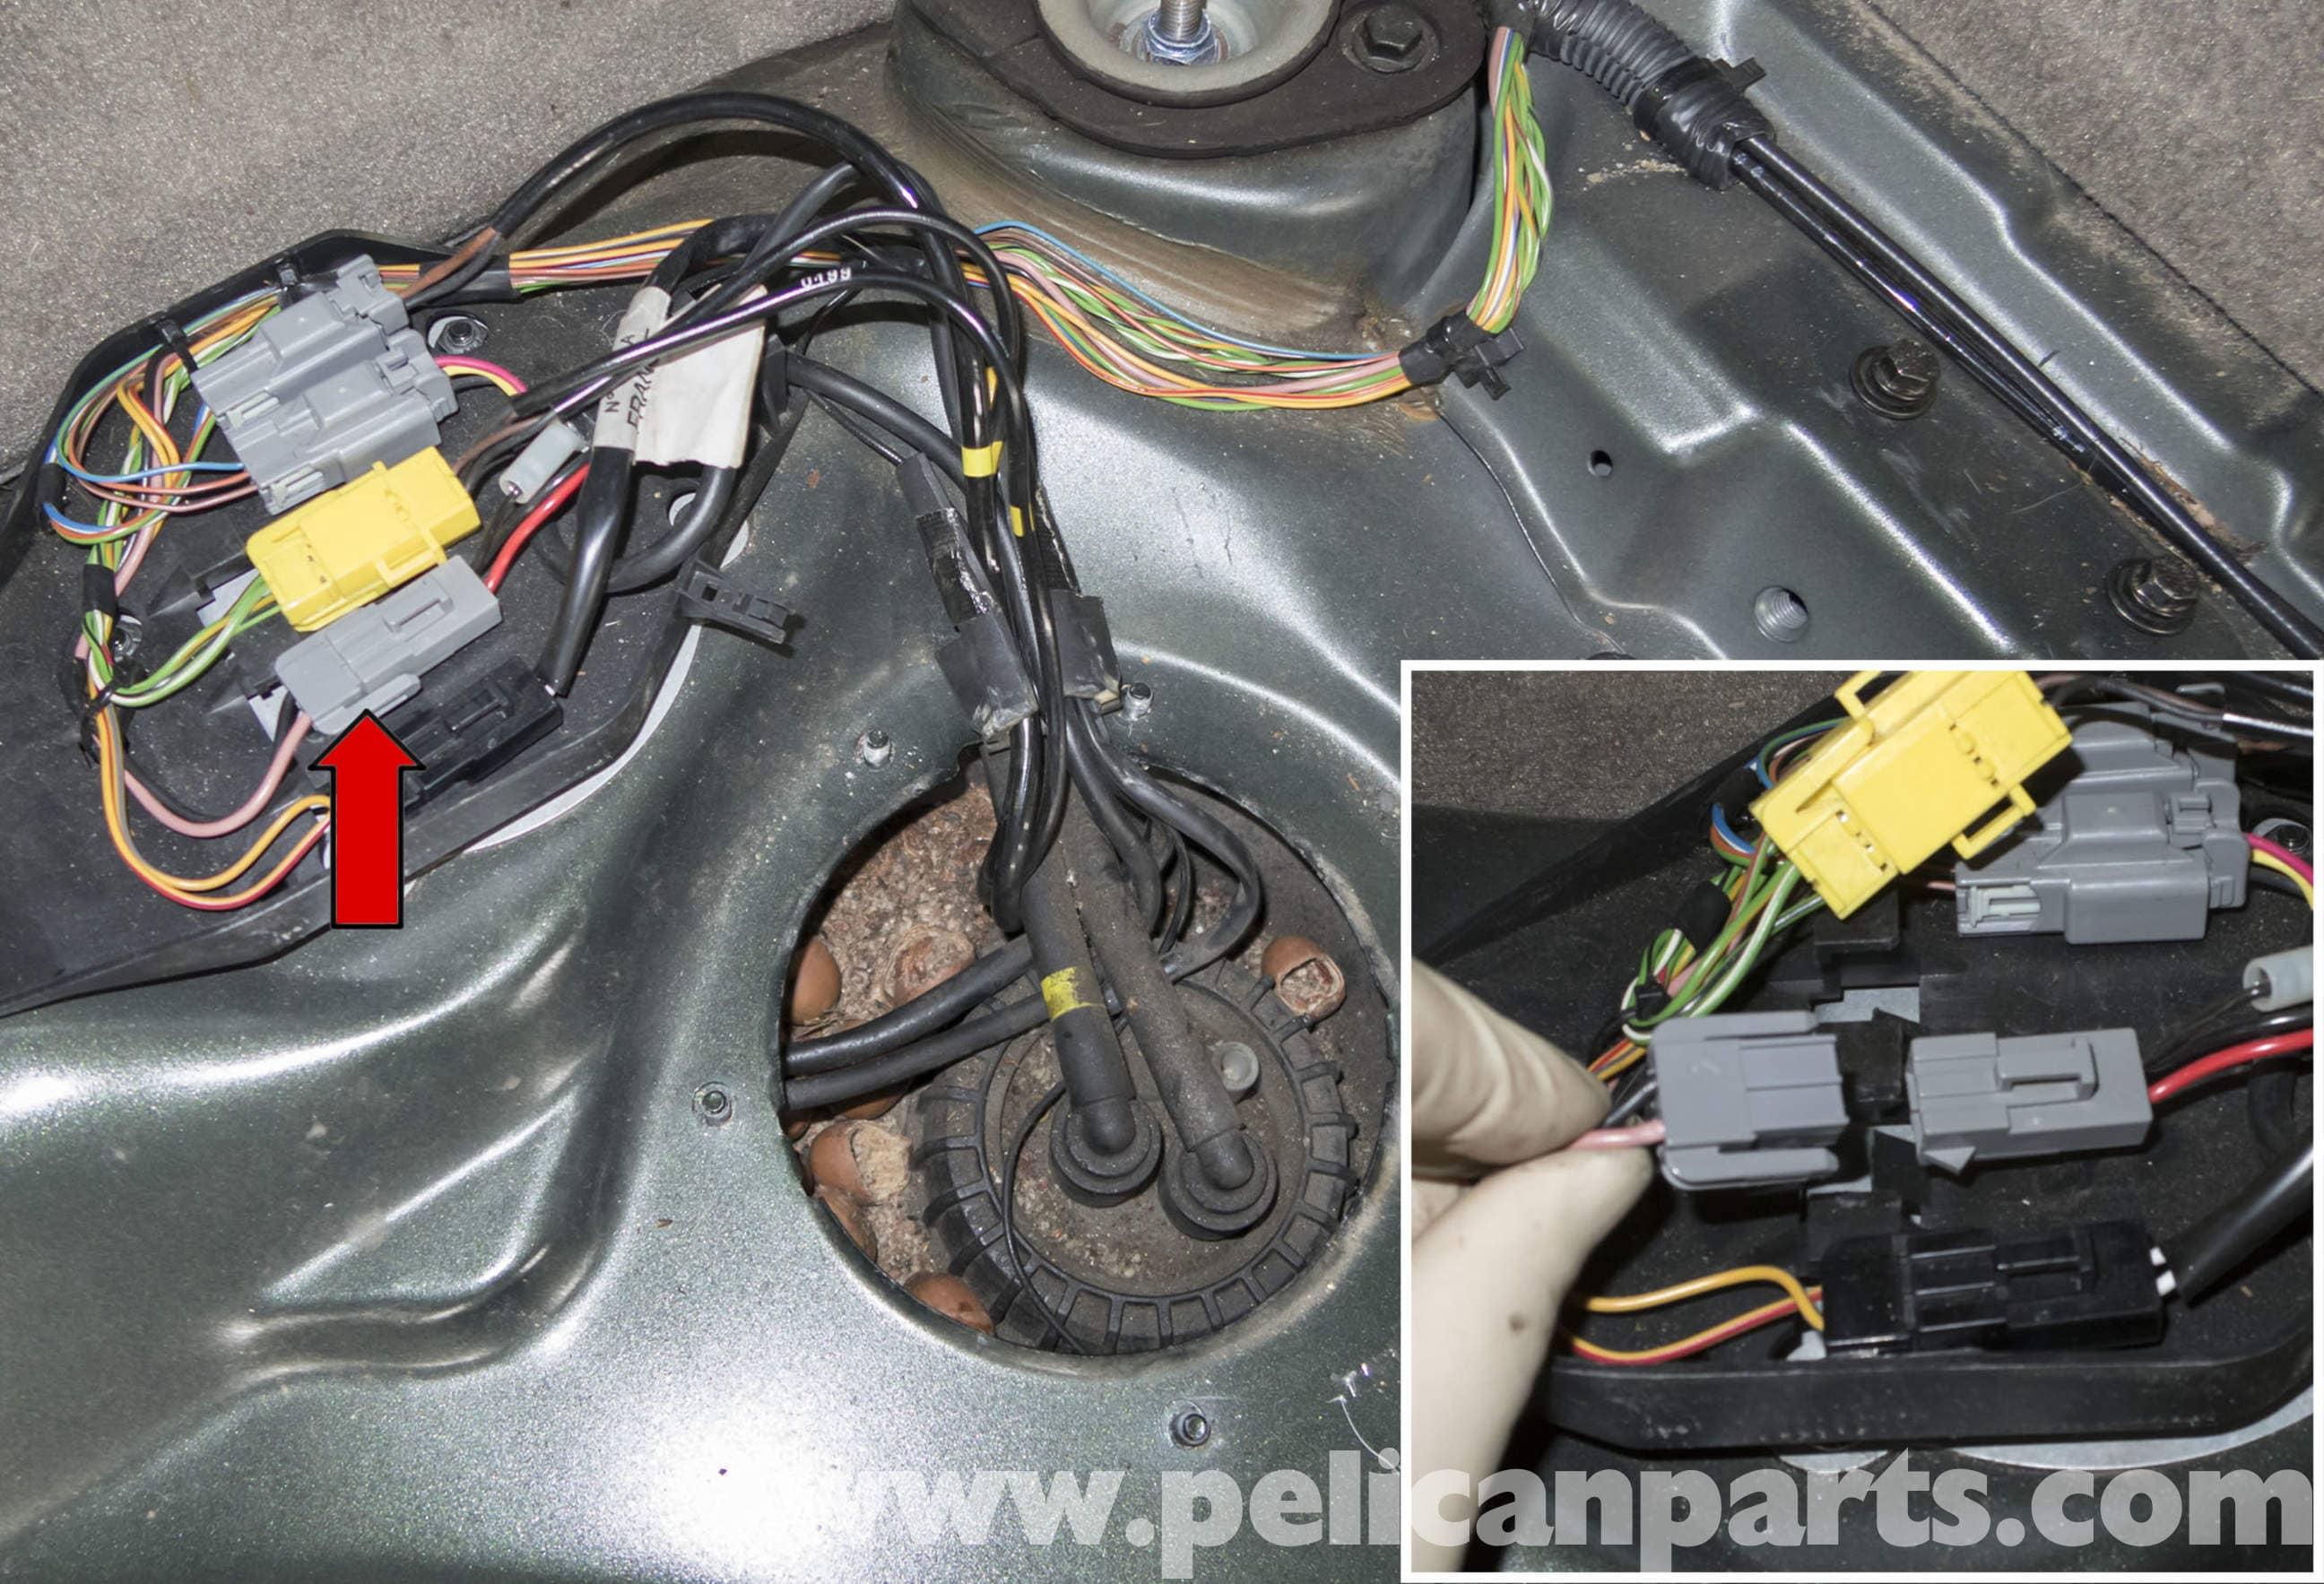 volvo xc90 audio wiring diagram 110cc pit bike v70 fuel pump replacement (1998-2007) - pelican parts diy maintenance article